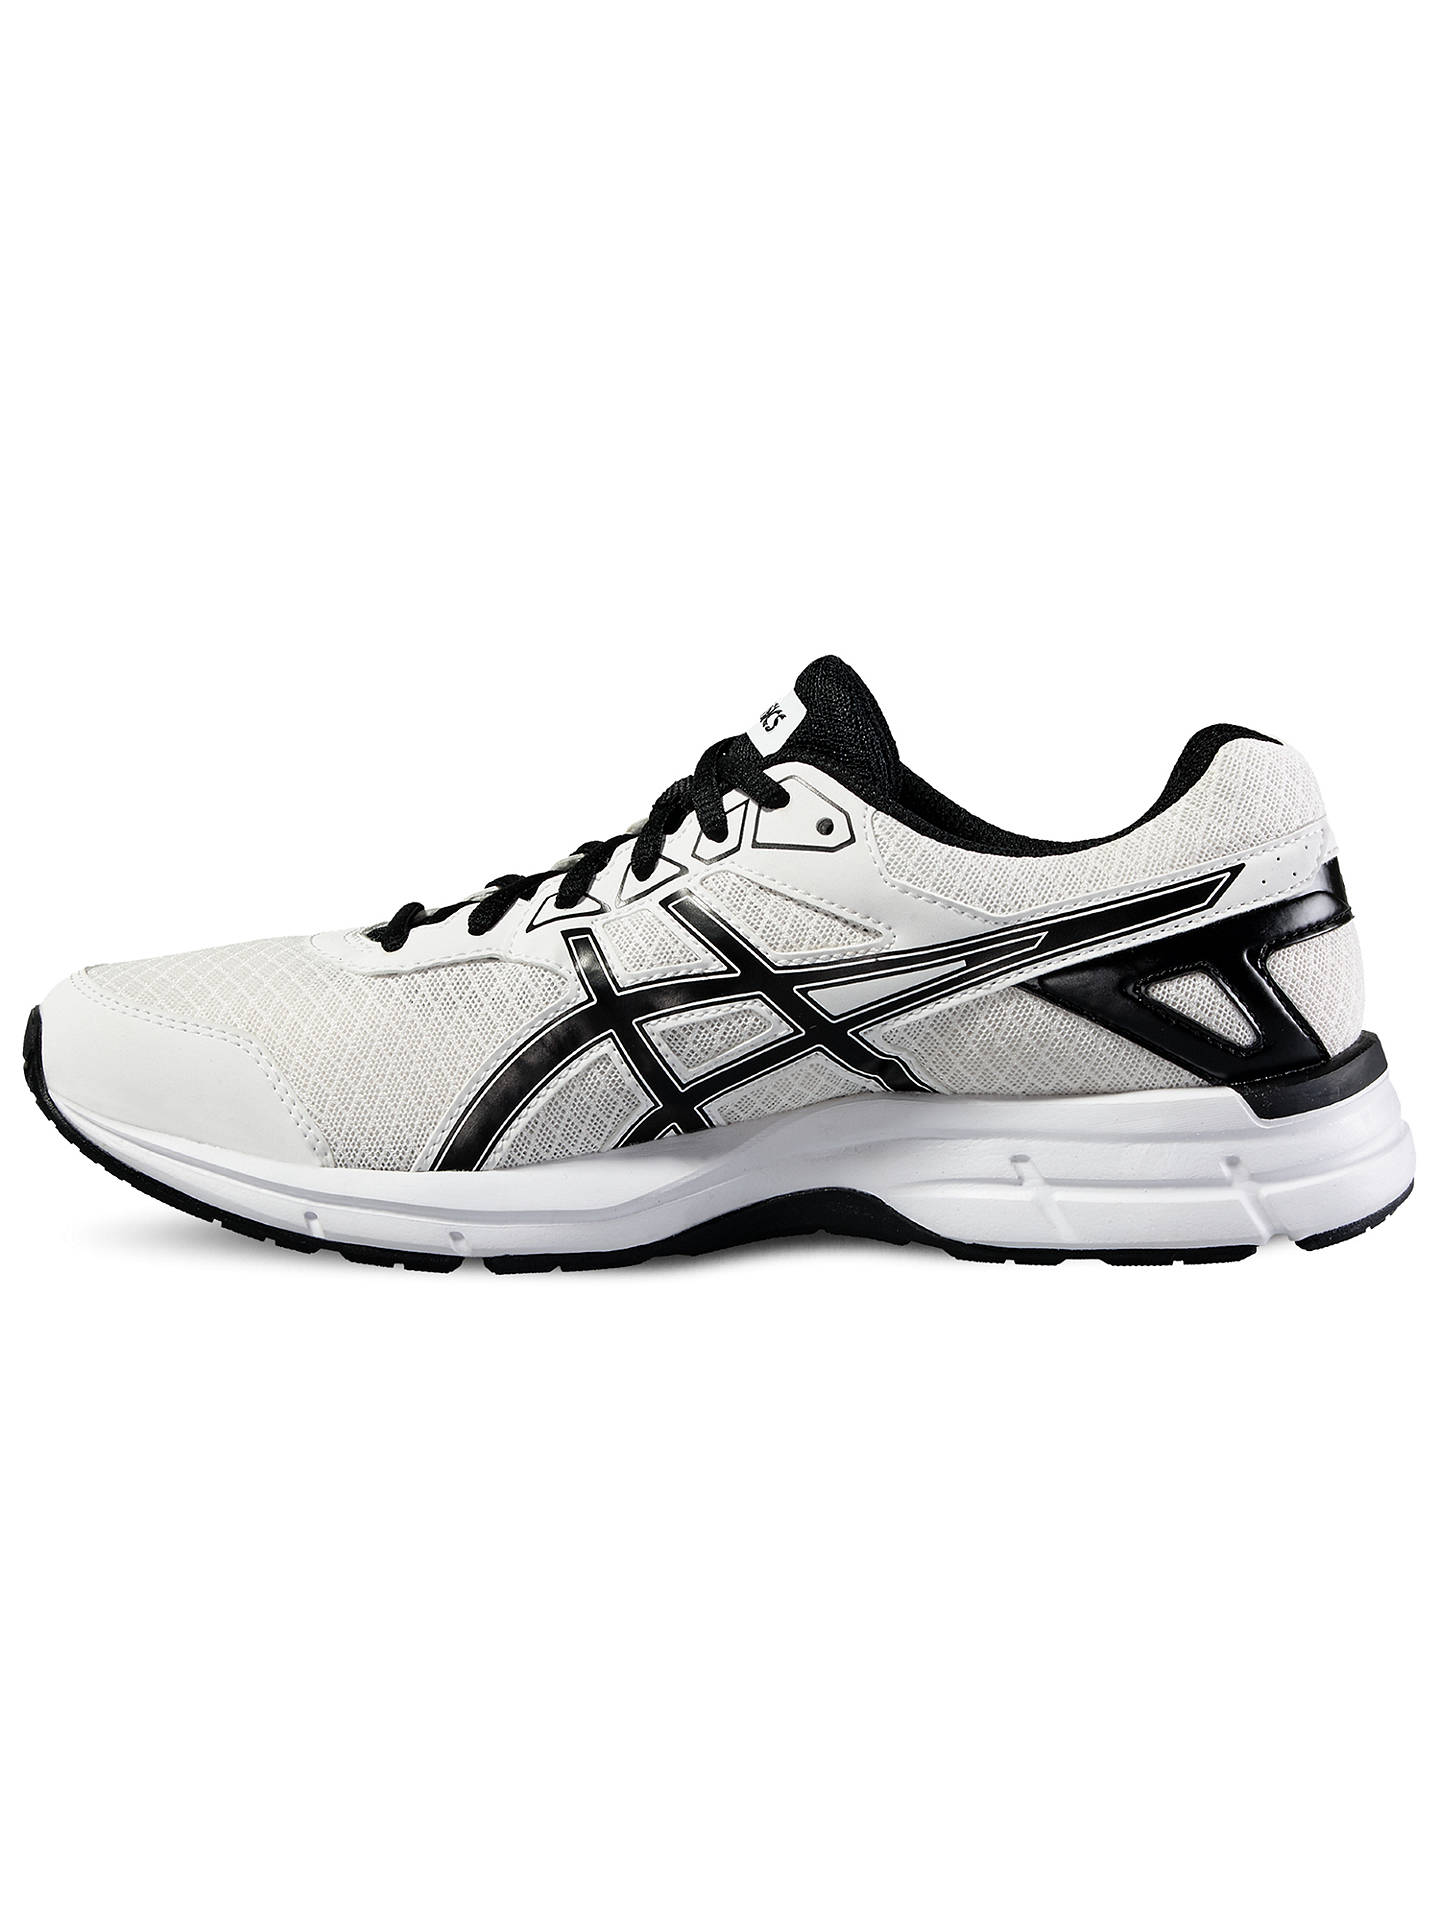 Asics GEL GALAXY 9 Men's Running Shoes